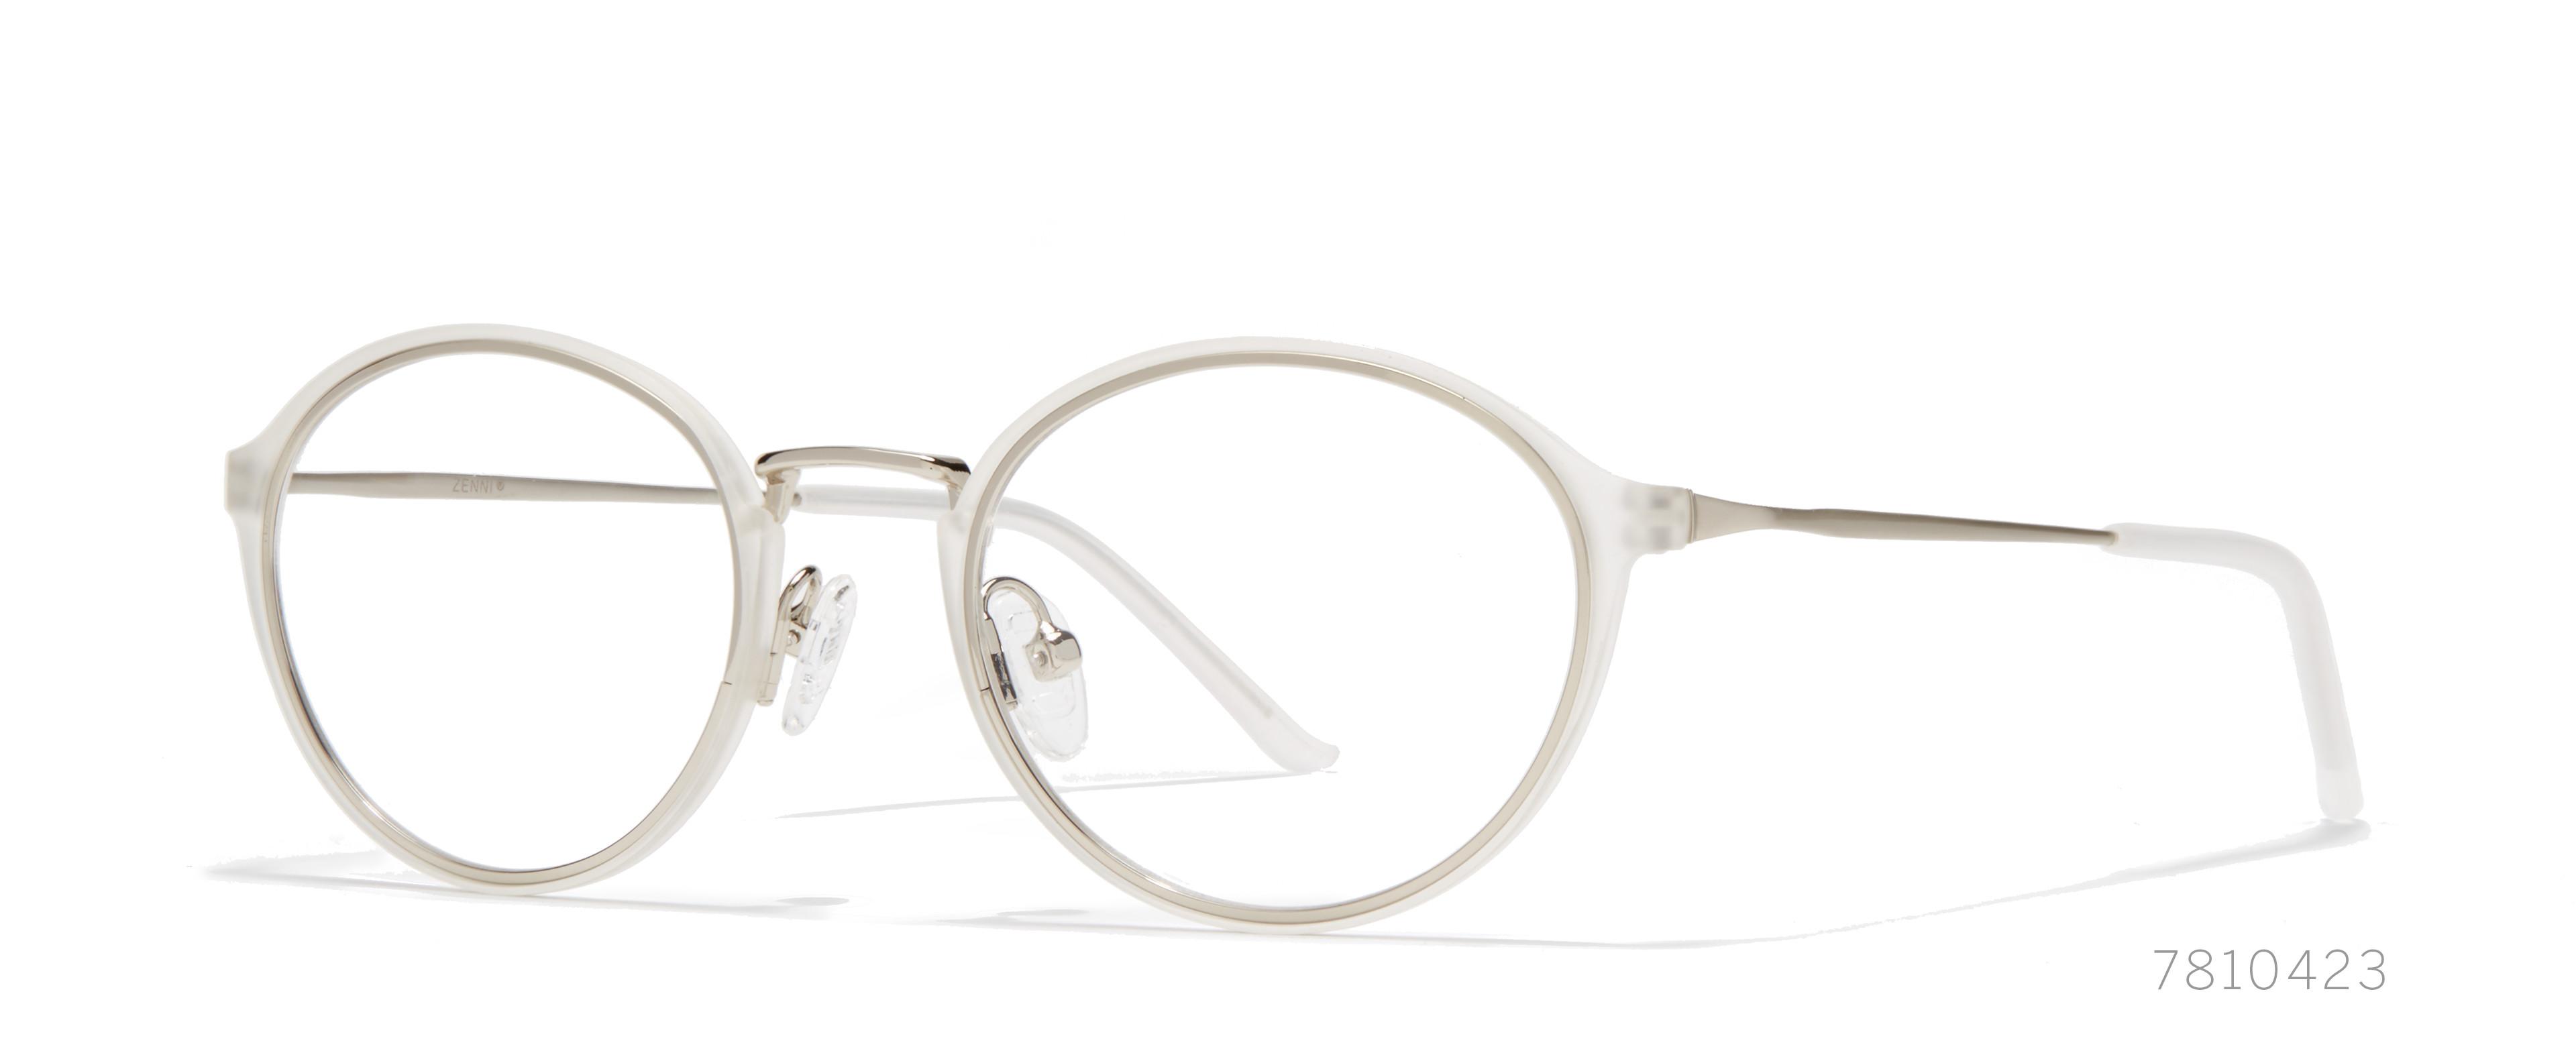 white round eyeglasses